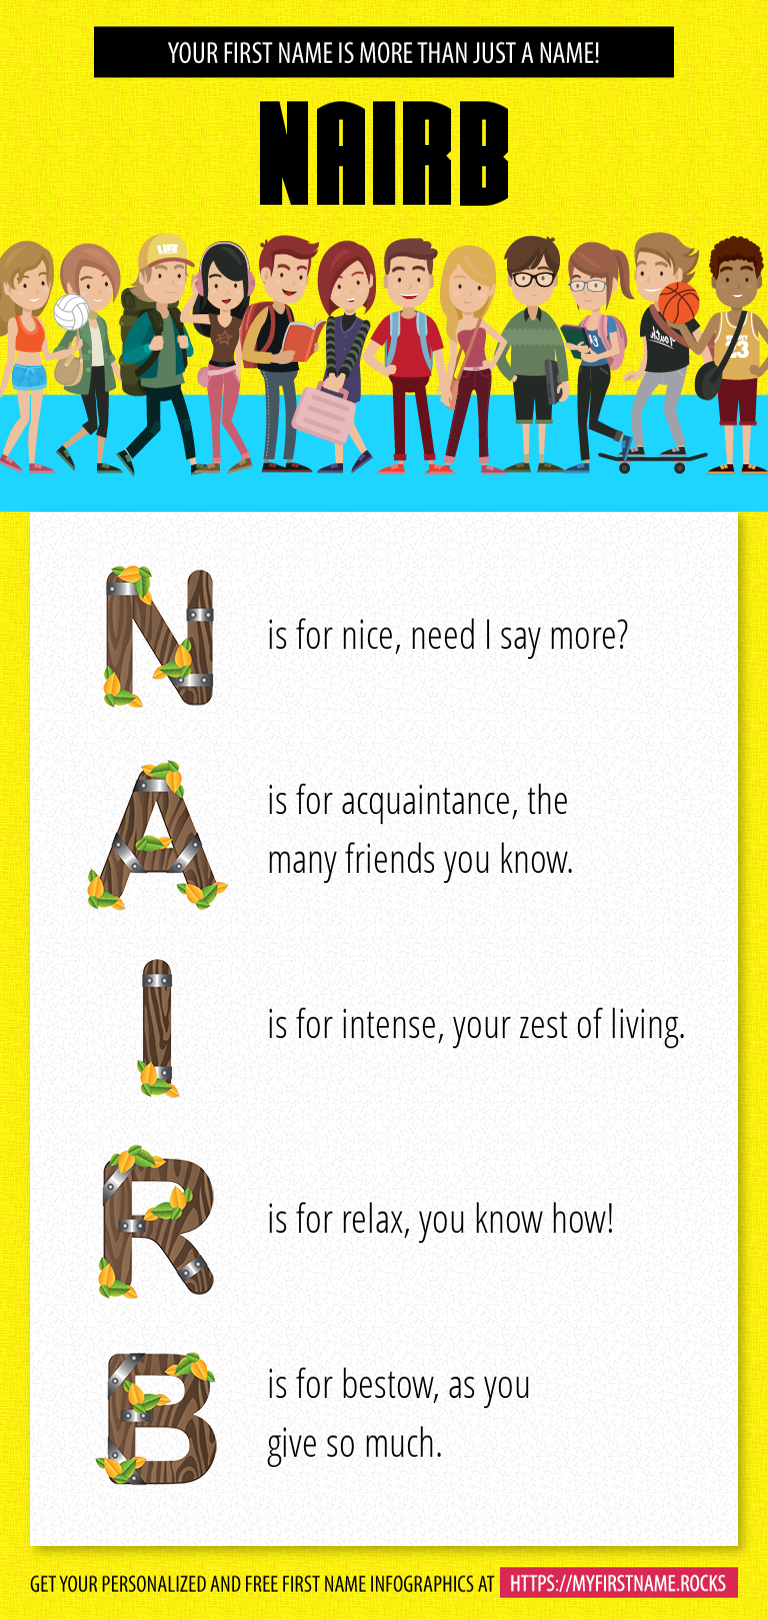 Nairb Infographics